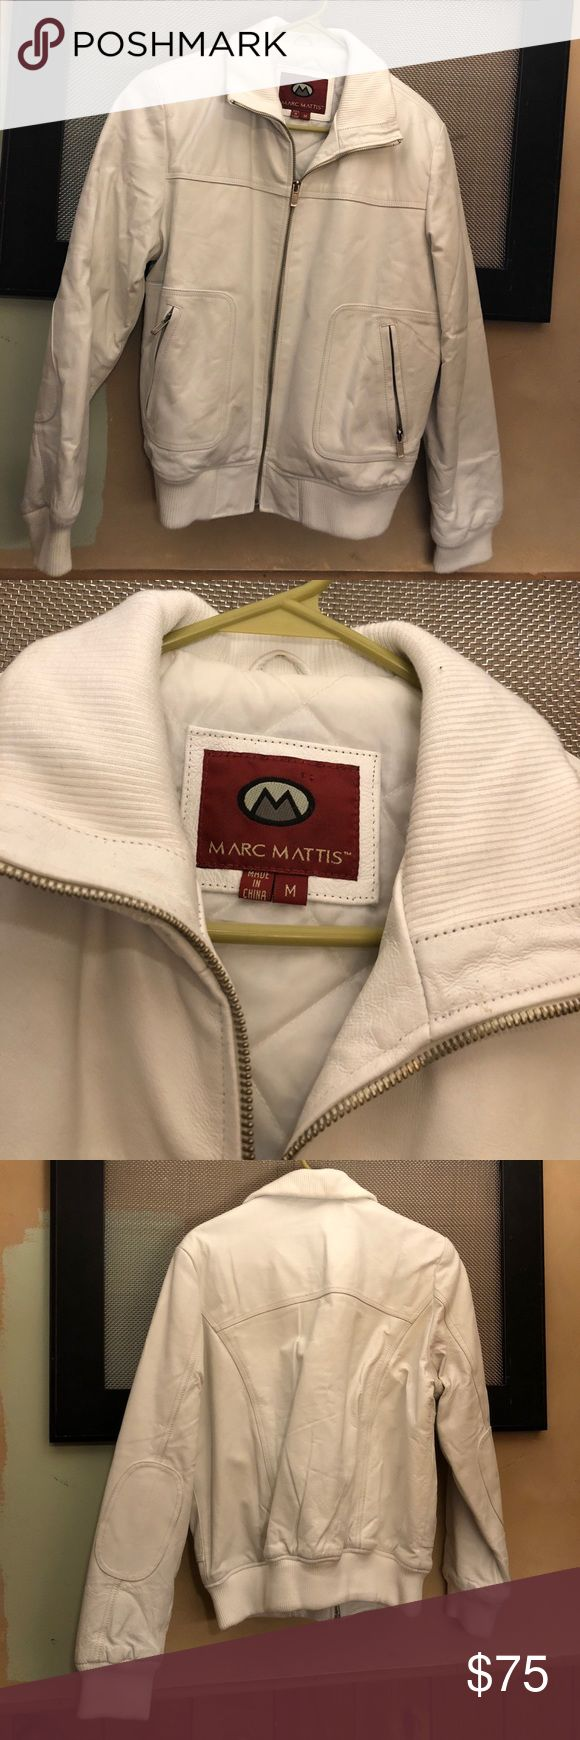 Fully lined white leather bomber jacket ladies med Marc Mattis white leather bomber ladies. Fully lined. Zippered pockets. Good shape! Marc Mattis Jackets & Coats